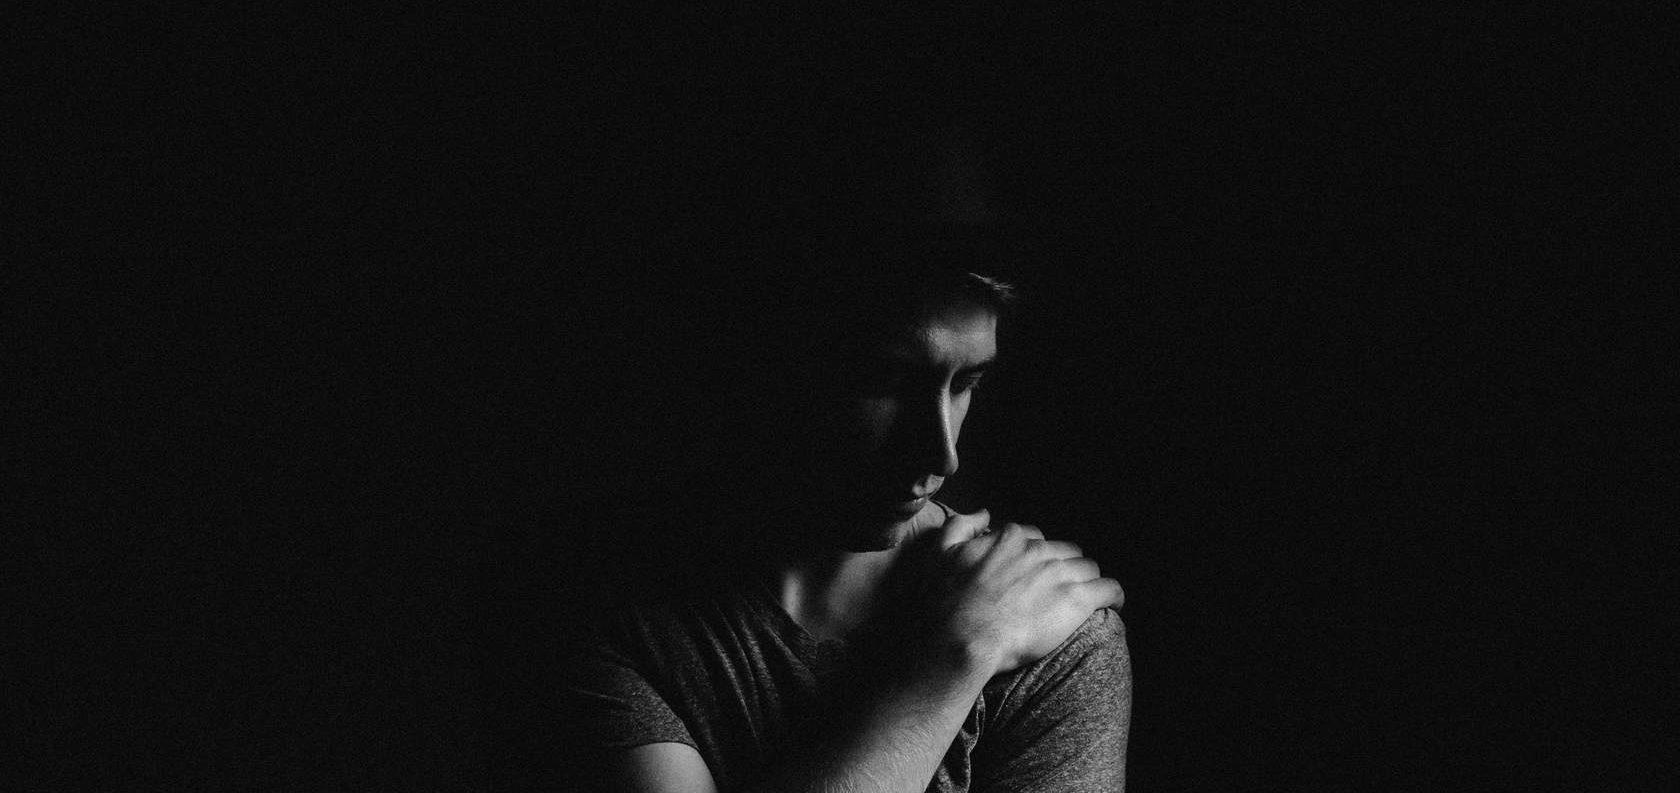 Man sitting alone in the dark, looking forlorn